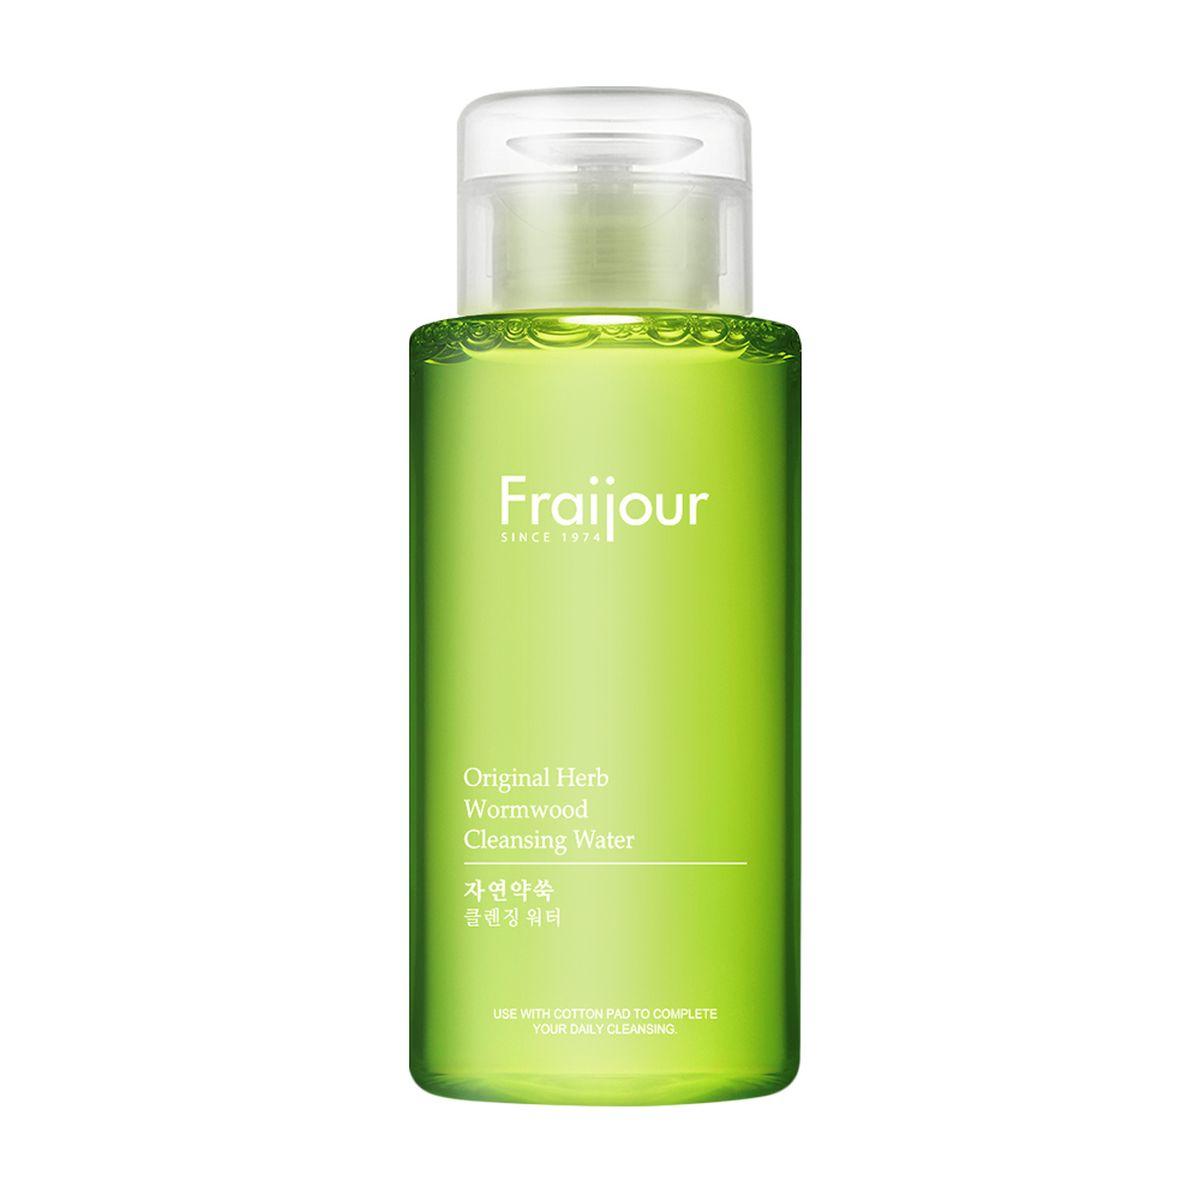 Жидкость для снятия макияжа EVAS Fraijour Original Herb Wormwood Cleansing Water - 300 мл